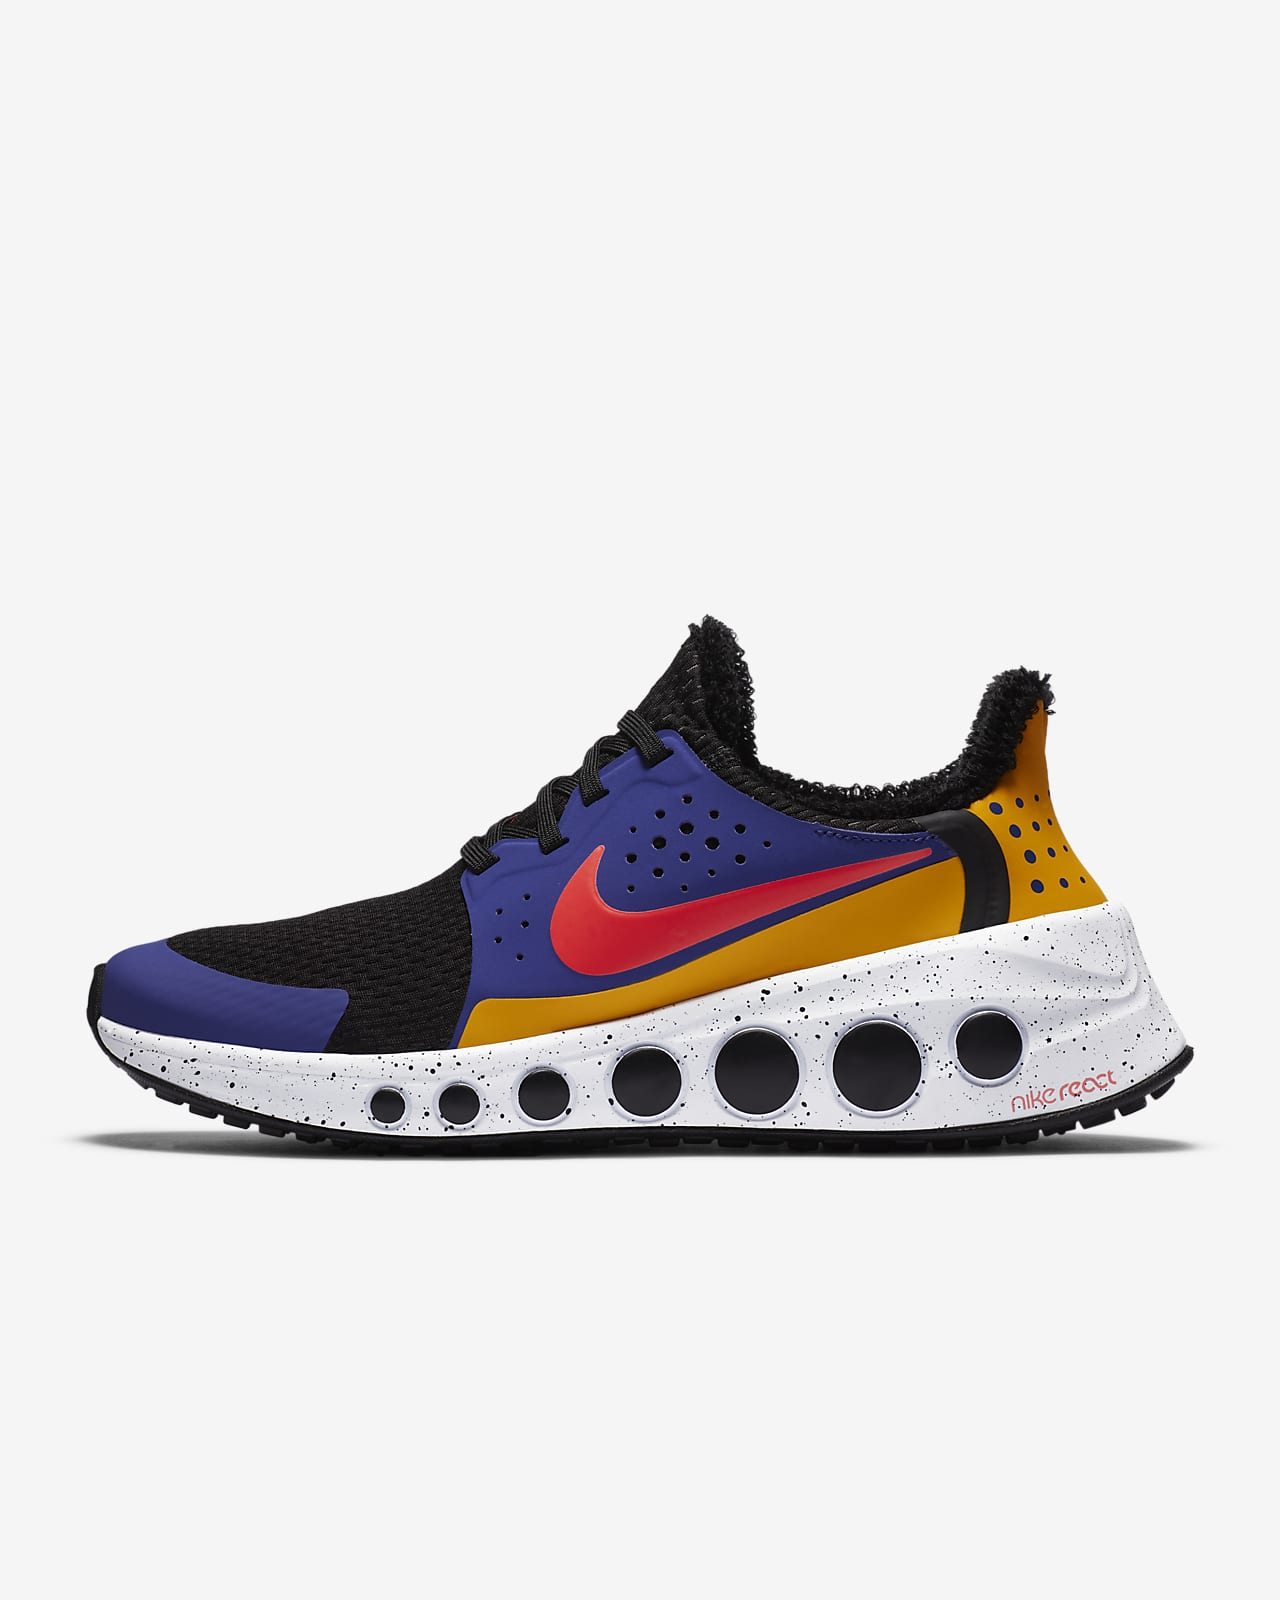 Sko Nike CruzrOne Unisex